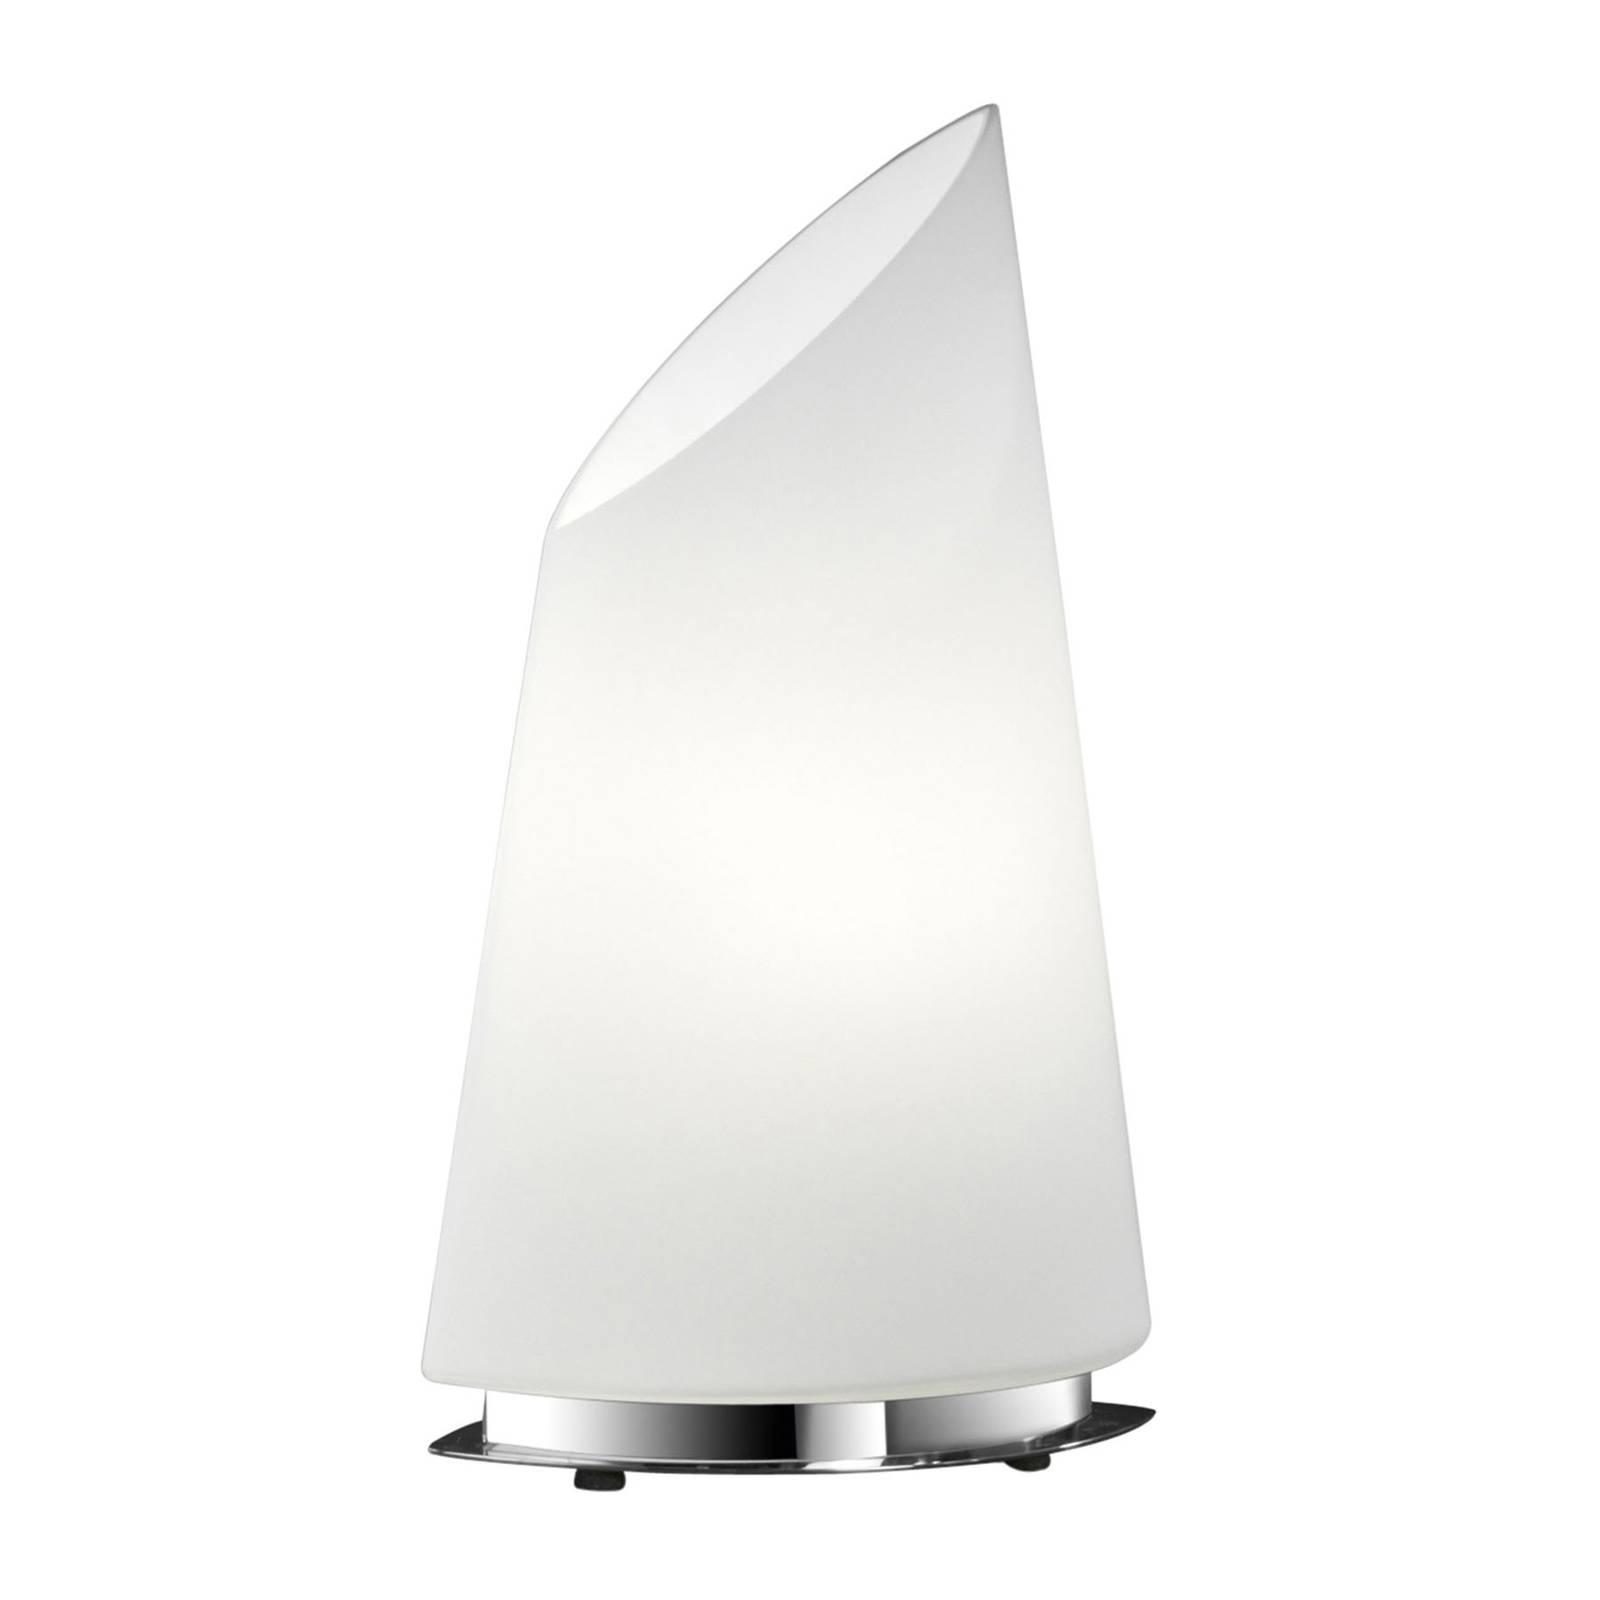 BANKAMP Sail lampe à poser en verre, 42 cm, dim